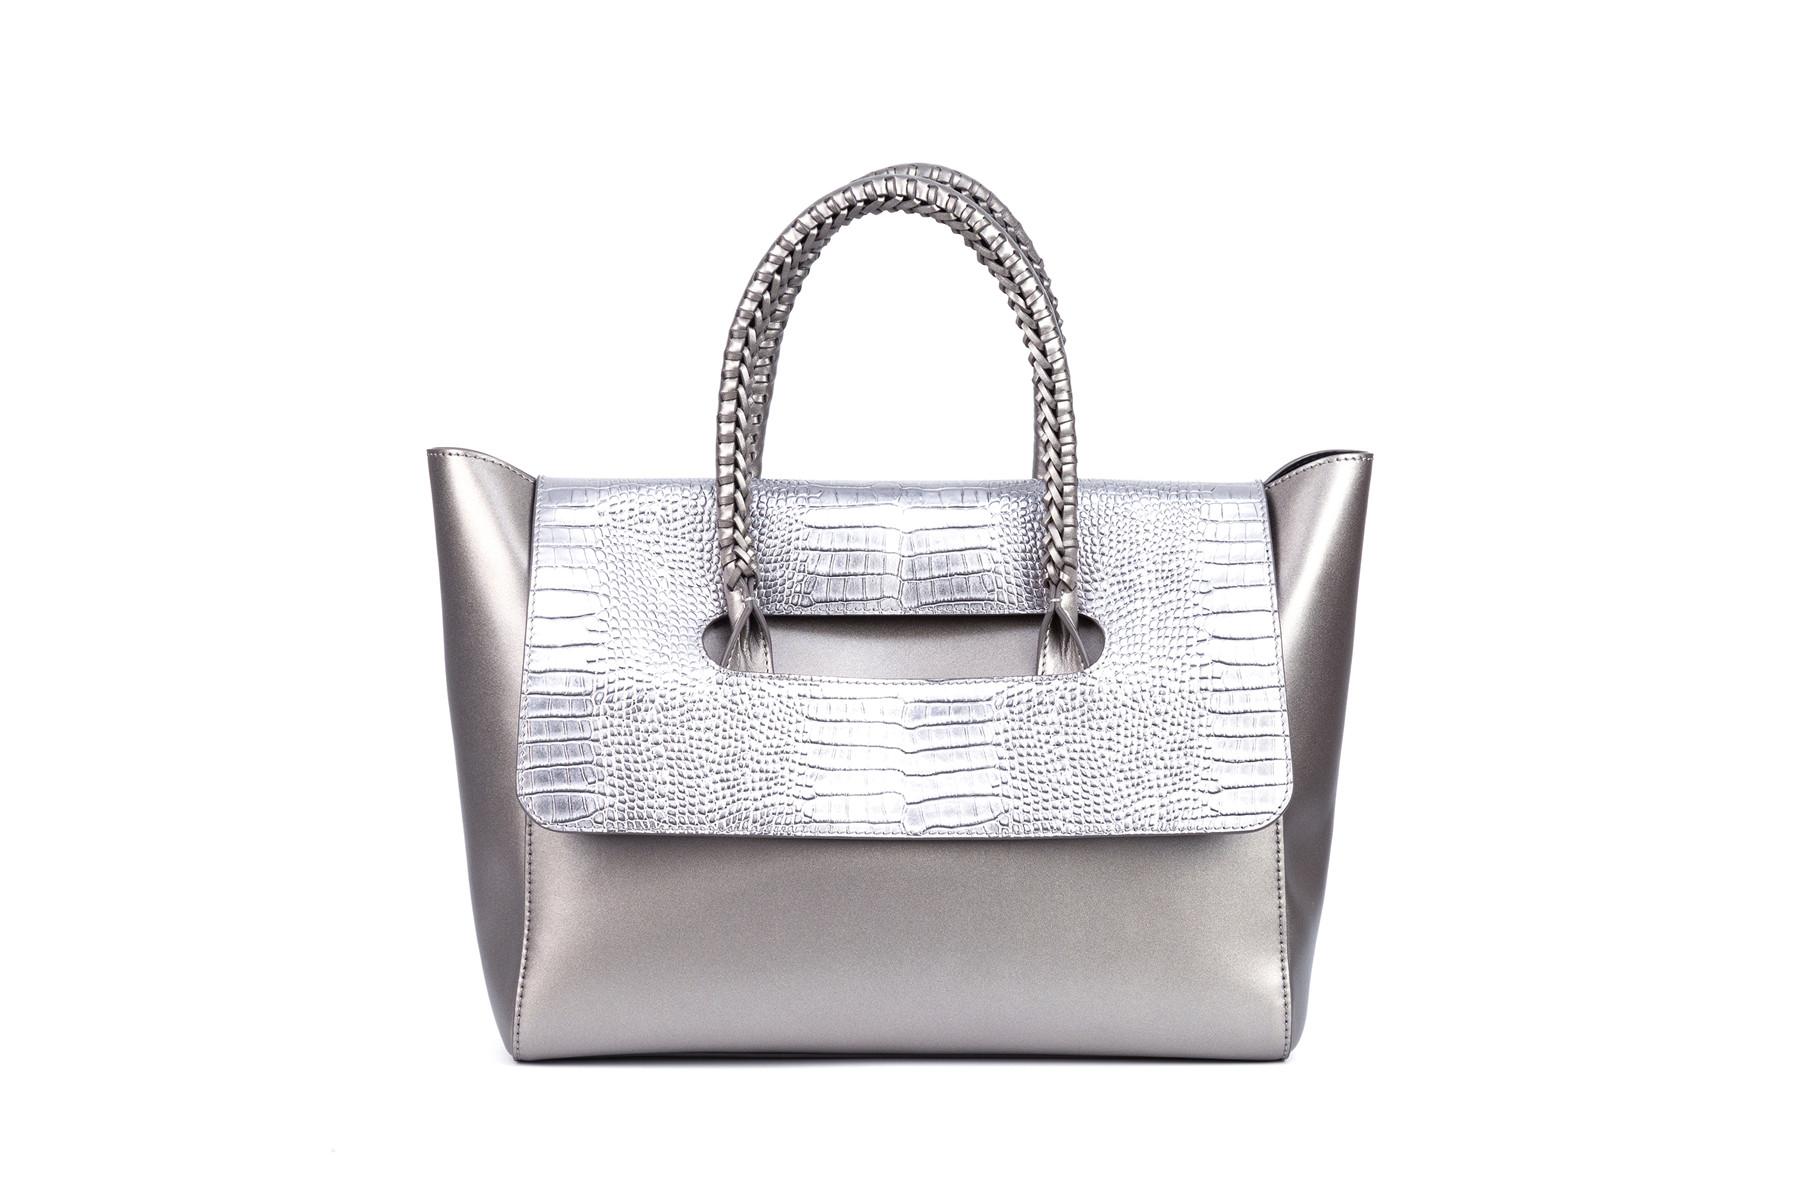 GF bags-Bulk Luxury Handbags Manufacturer, Affordable Handbags   Gf Bags-1